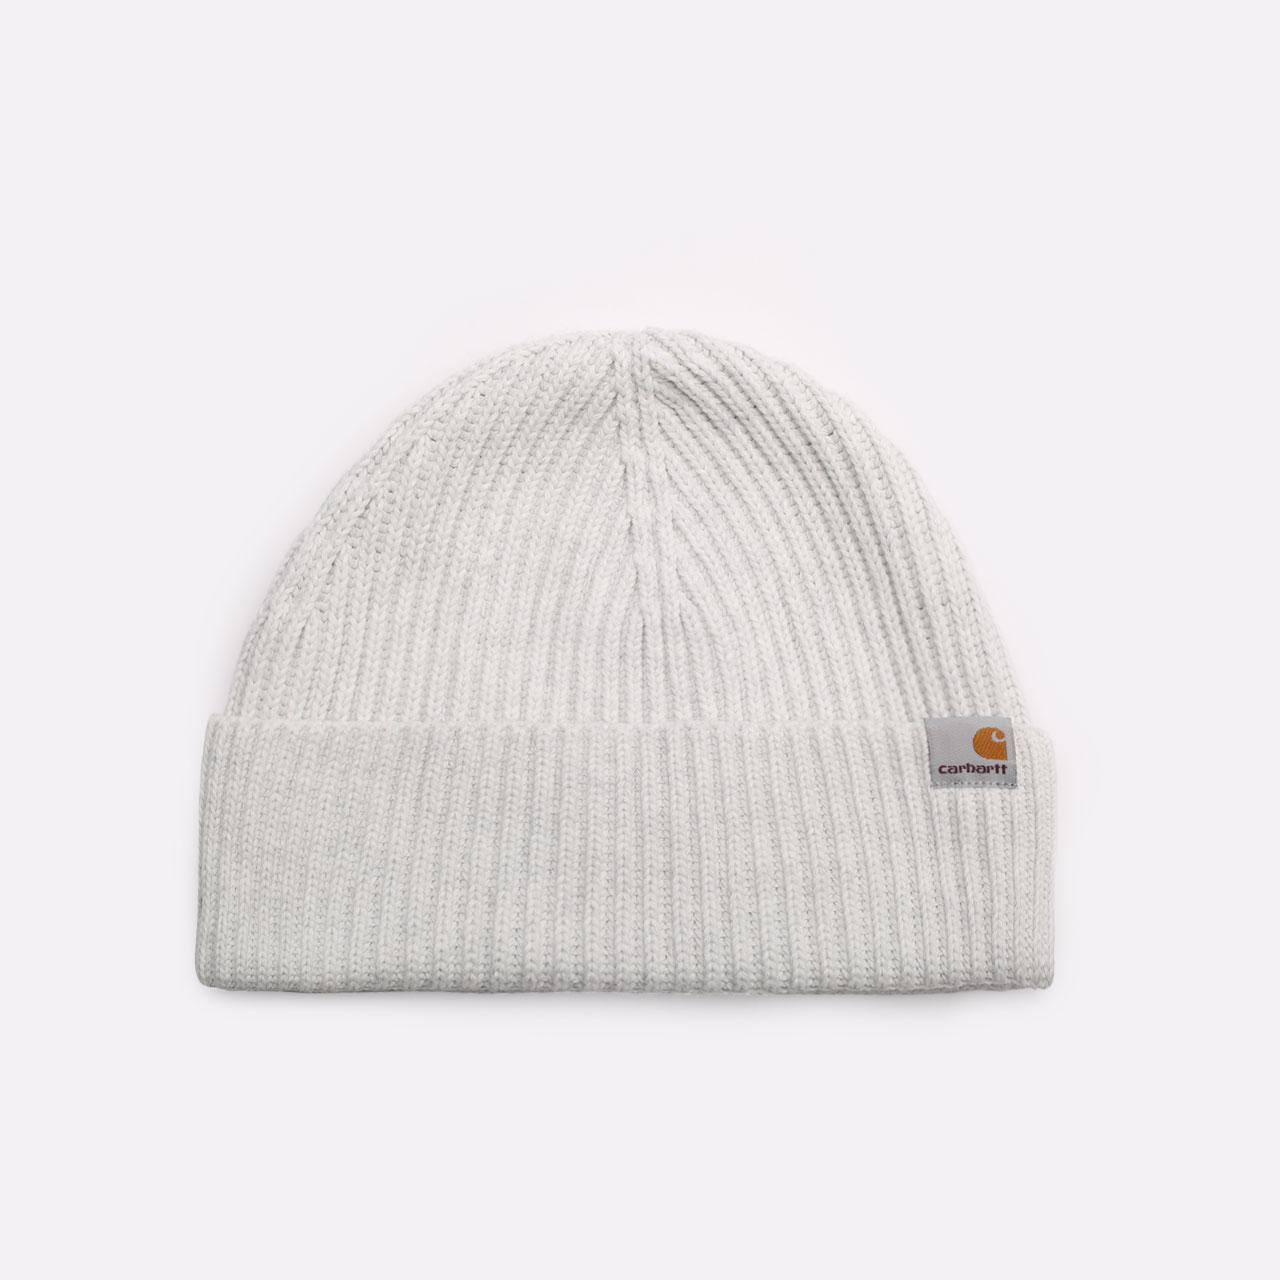 серая шапка Carhartt WIP Burbank Beanie I029491-ash heather - цена, описание, фото 1